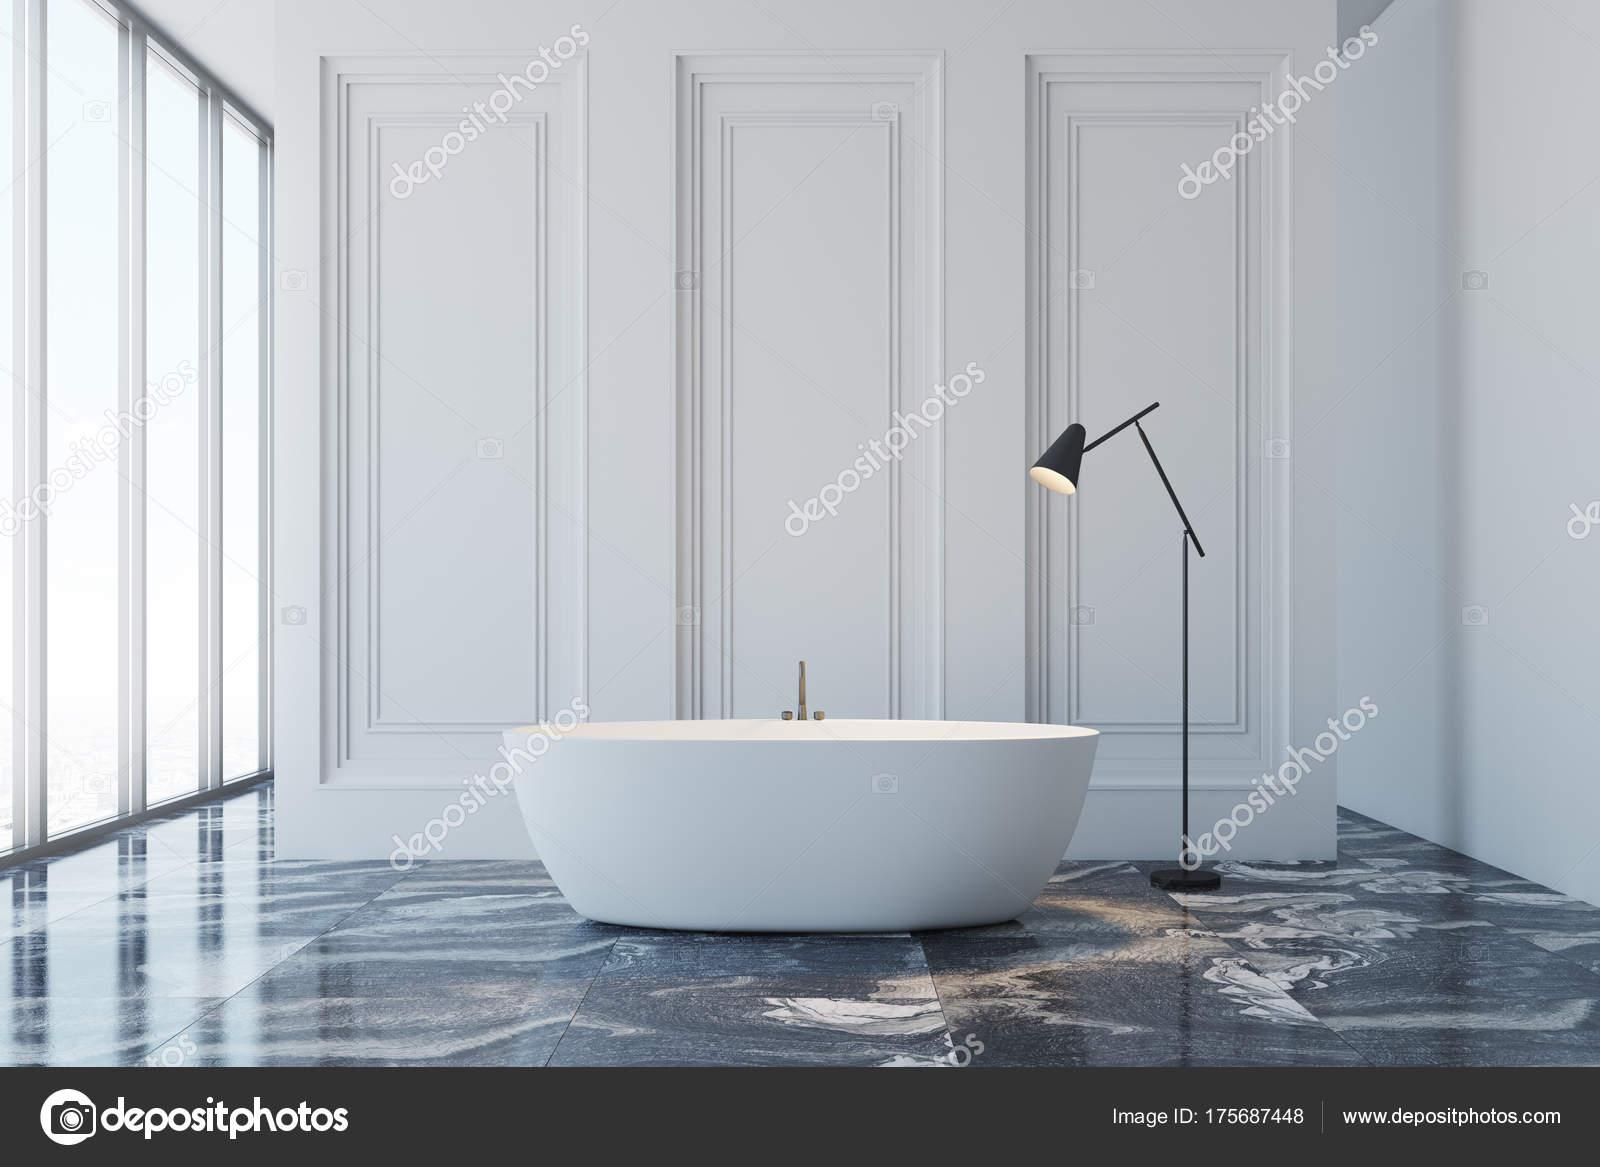 Marmeren Badkamer Vloer : Marmeren vloer badkamer u stockfoto denisismagilov